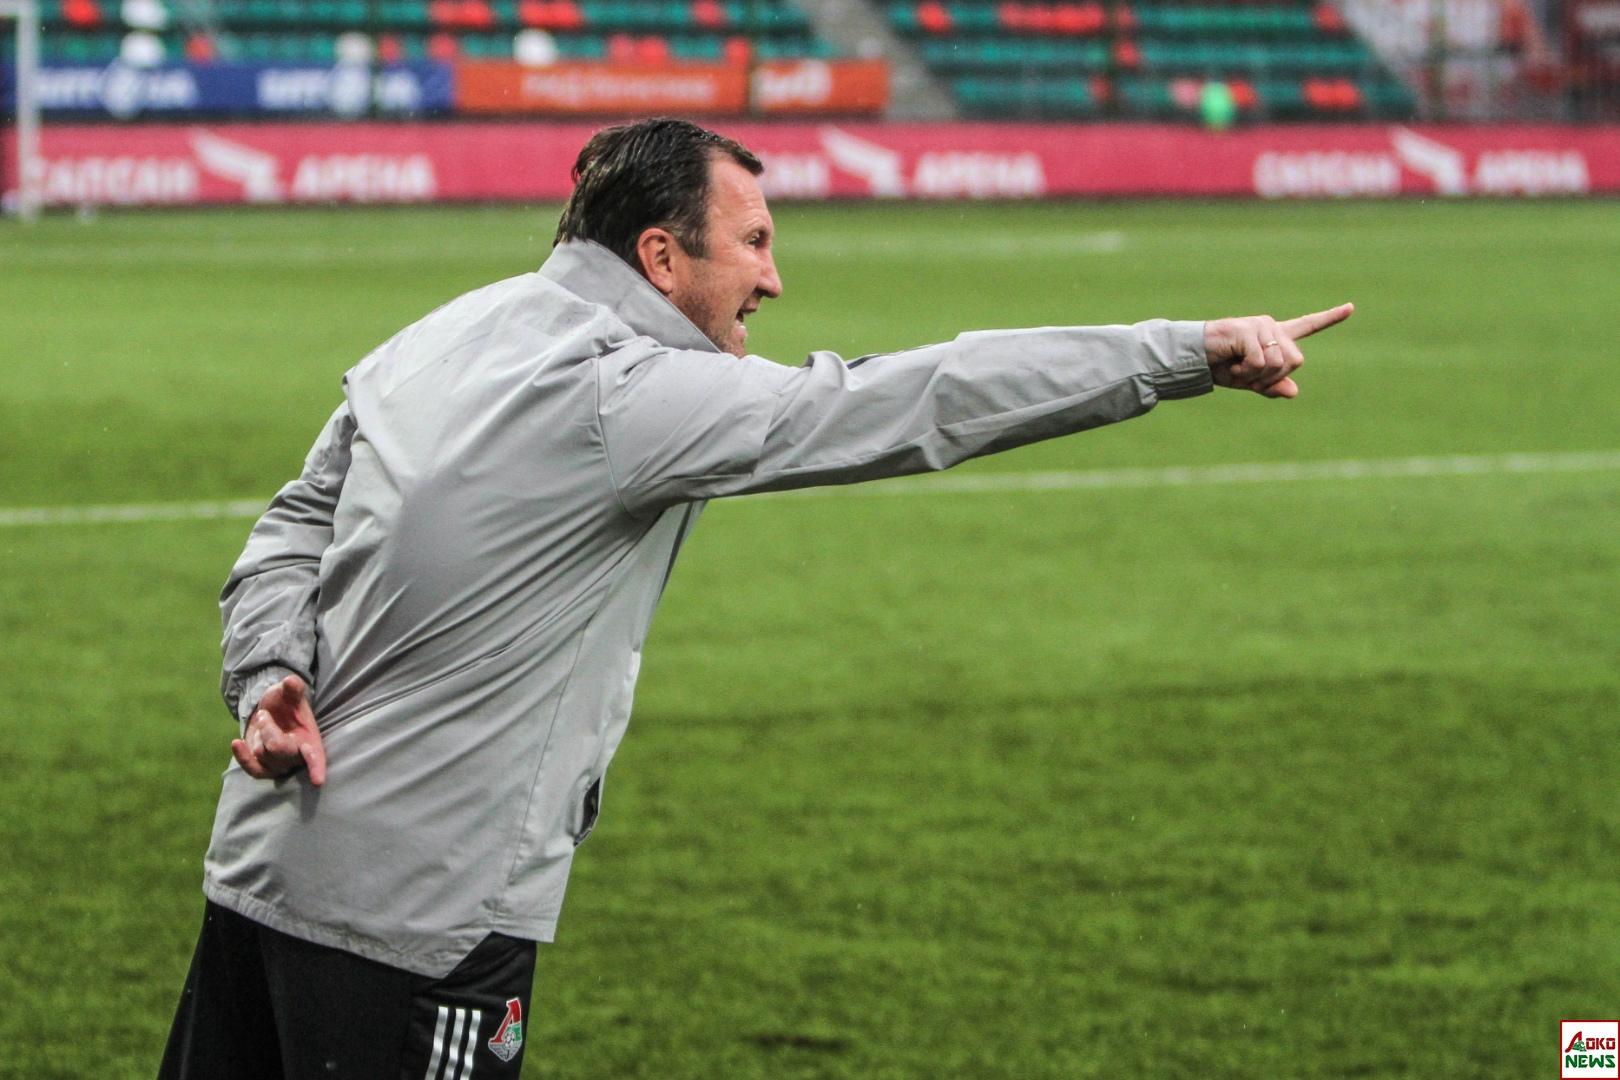 Локомотив мол. - Краснодар мол. Фото: Дмитрий Бурдонов / Loko.News